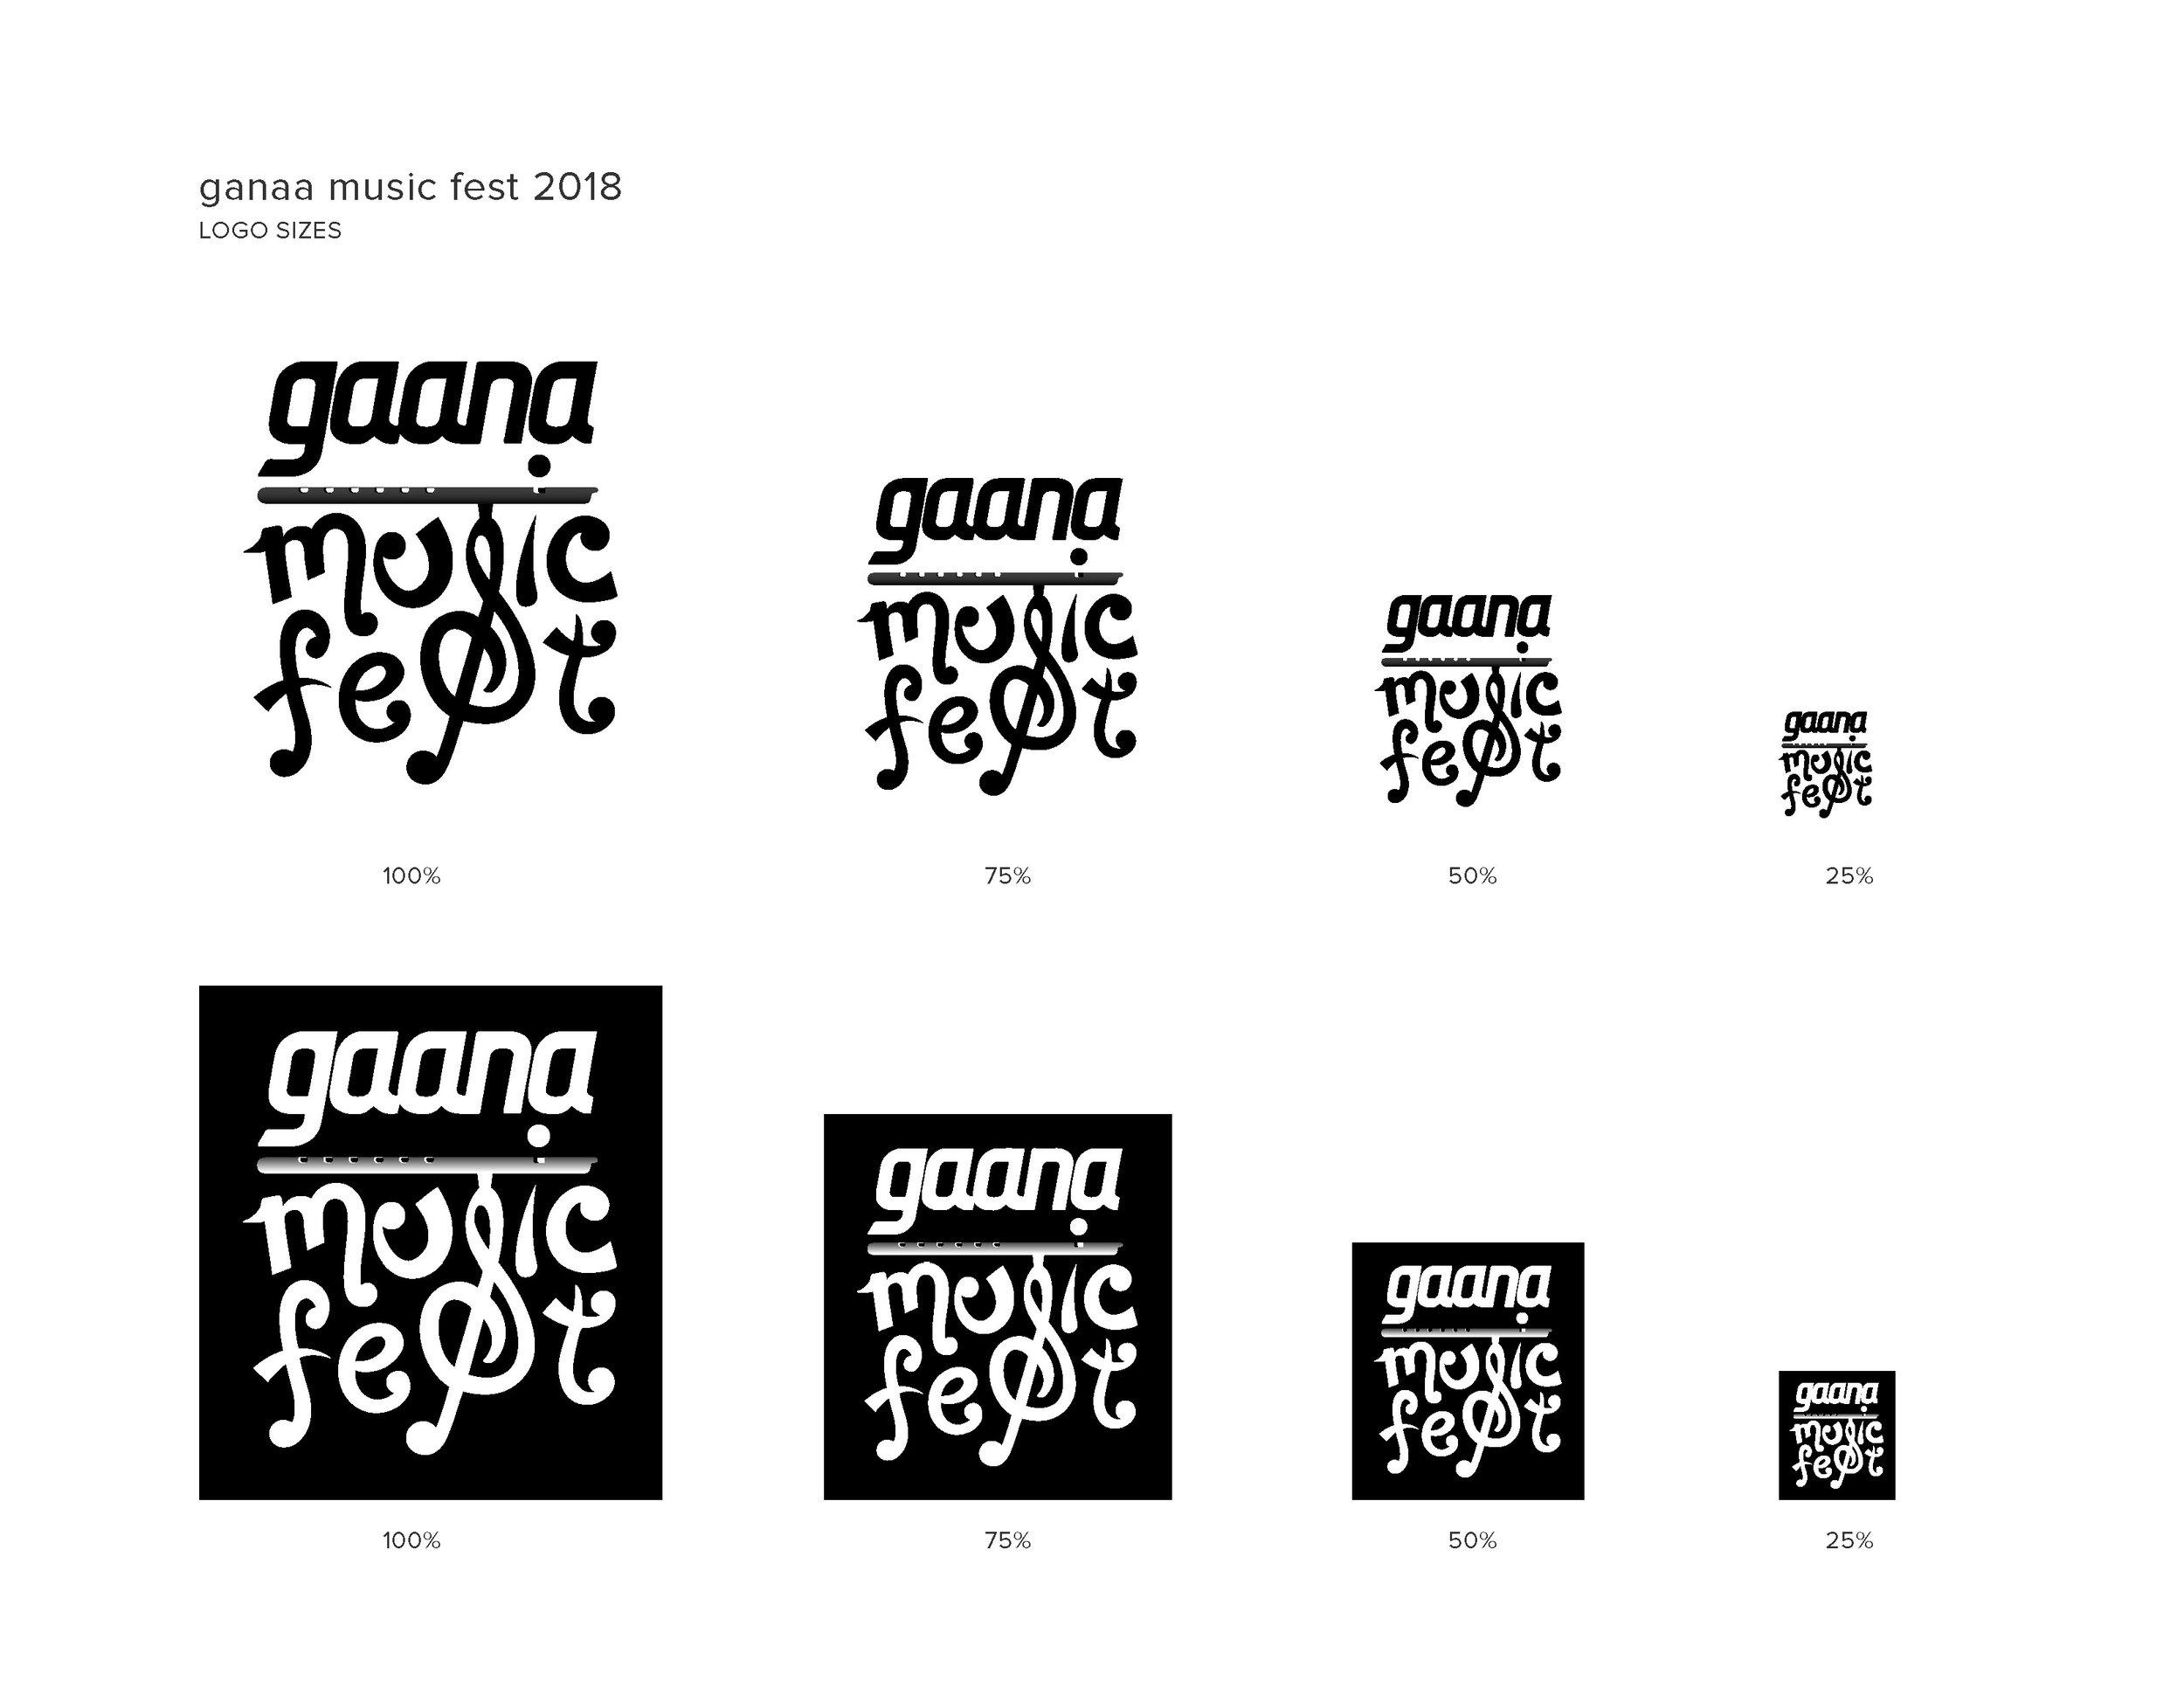 GaanaMusicFest2018_BRANDFINALs_Page_2.jpg